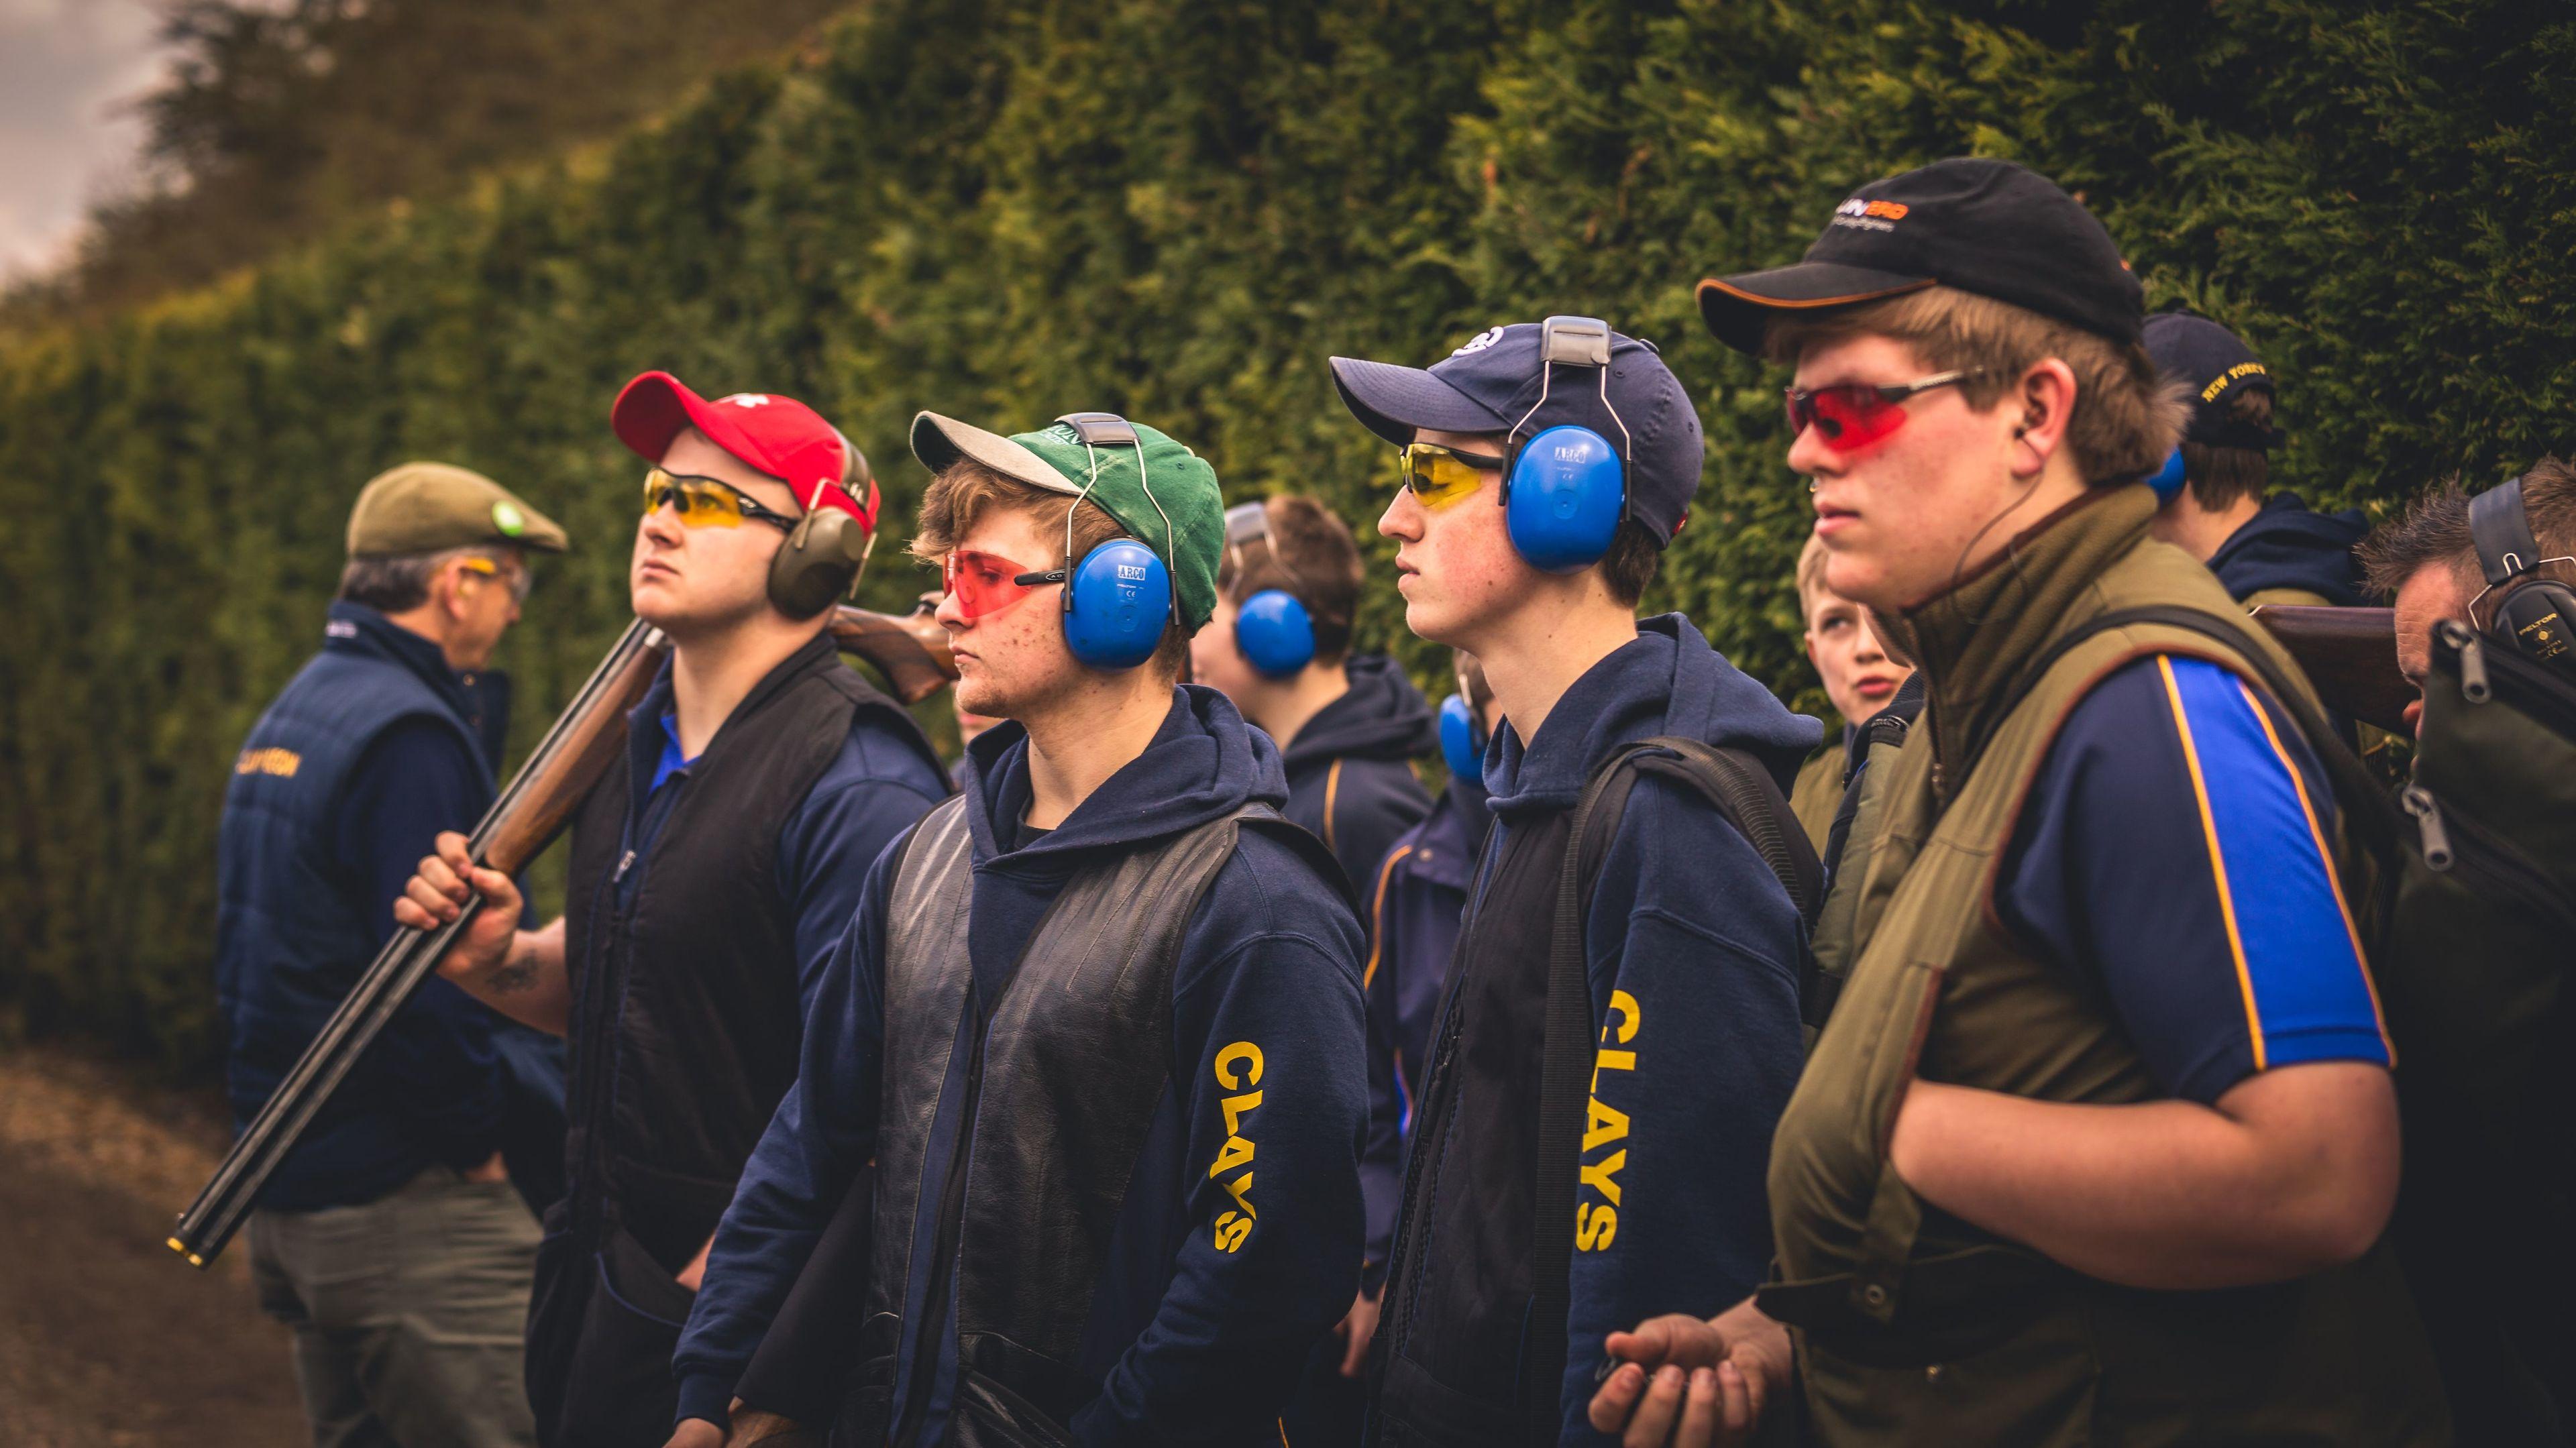 L-R: Strathallan shooters Keir Hail-Brown, Ben Addison-Scott, Rory Morrison-Low, James Day